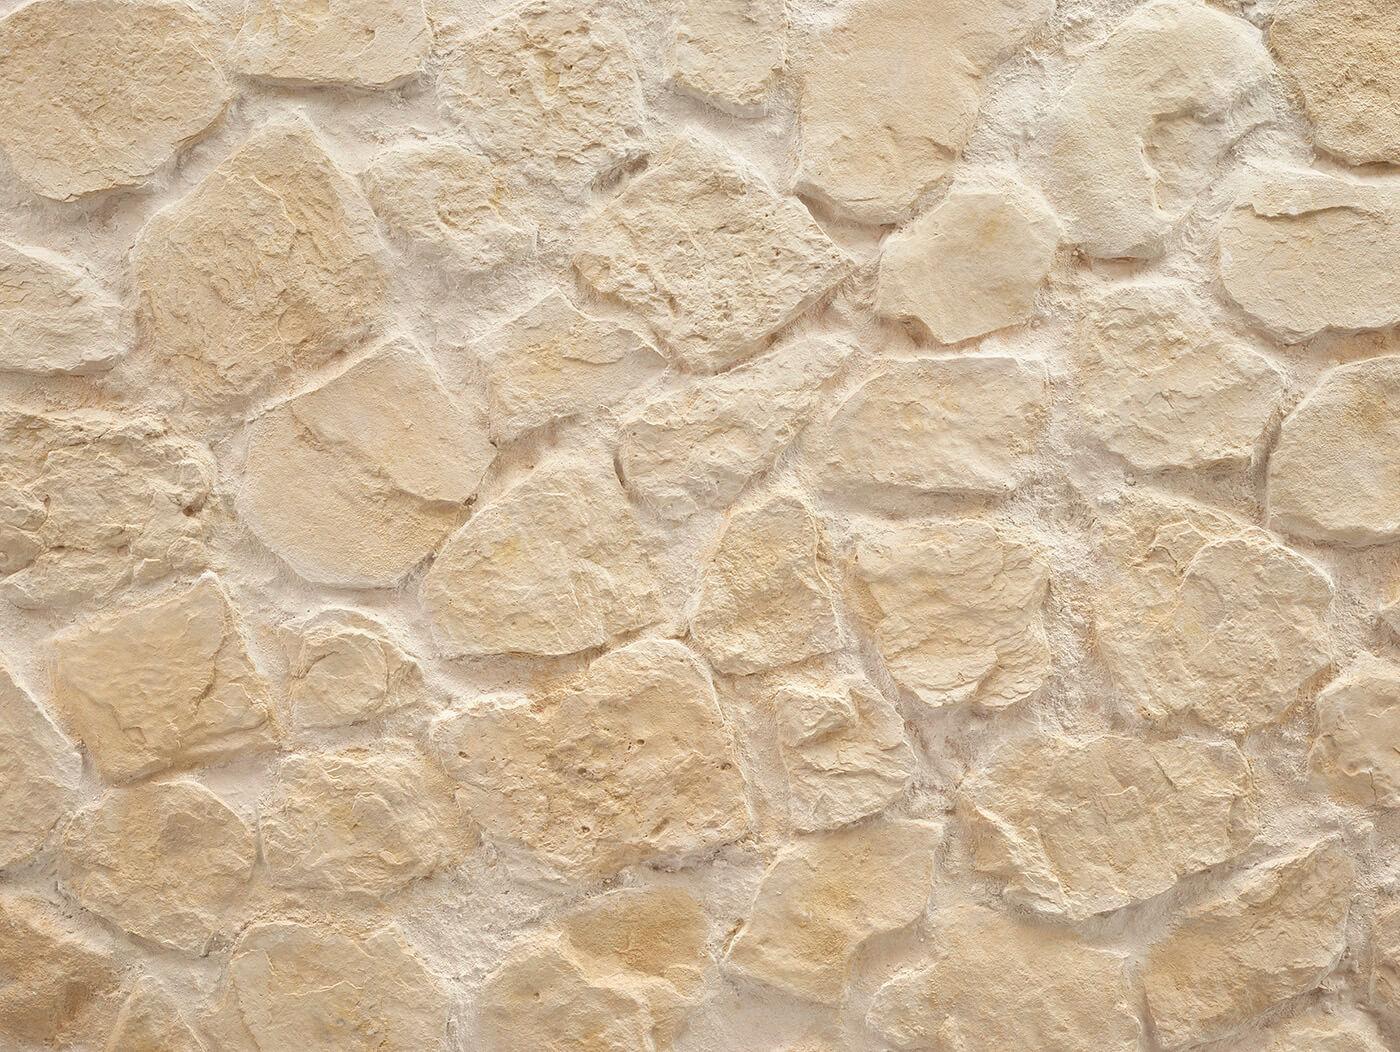 Piedra Lastra #blanca castellana